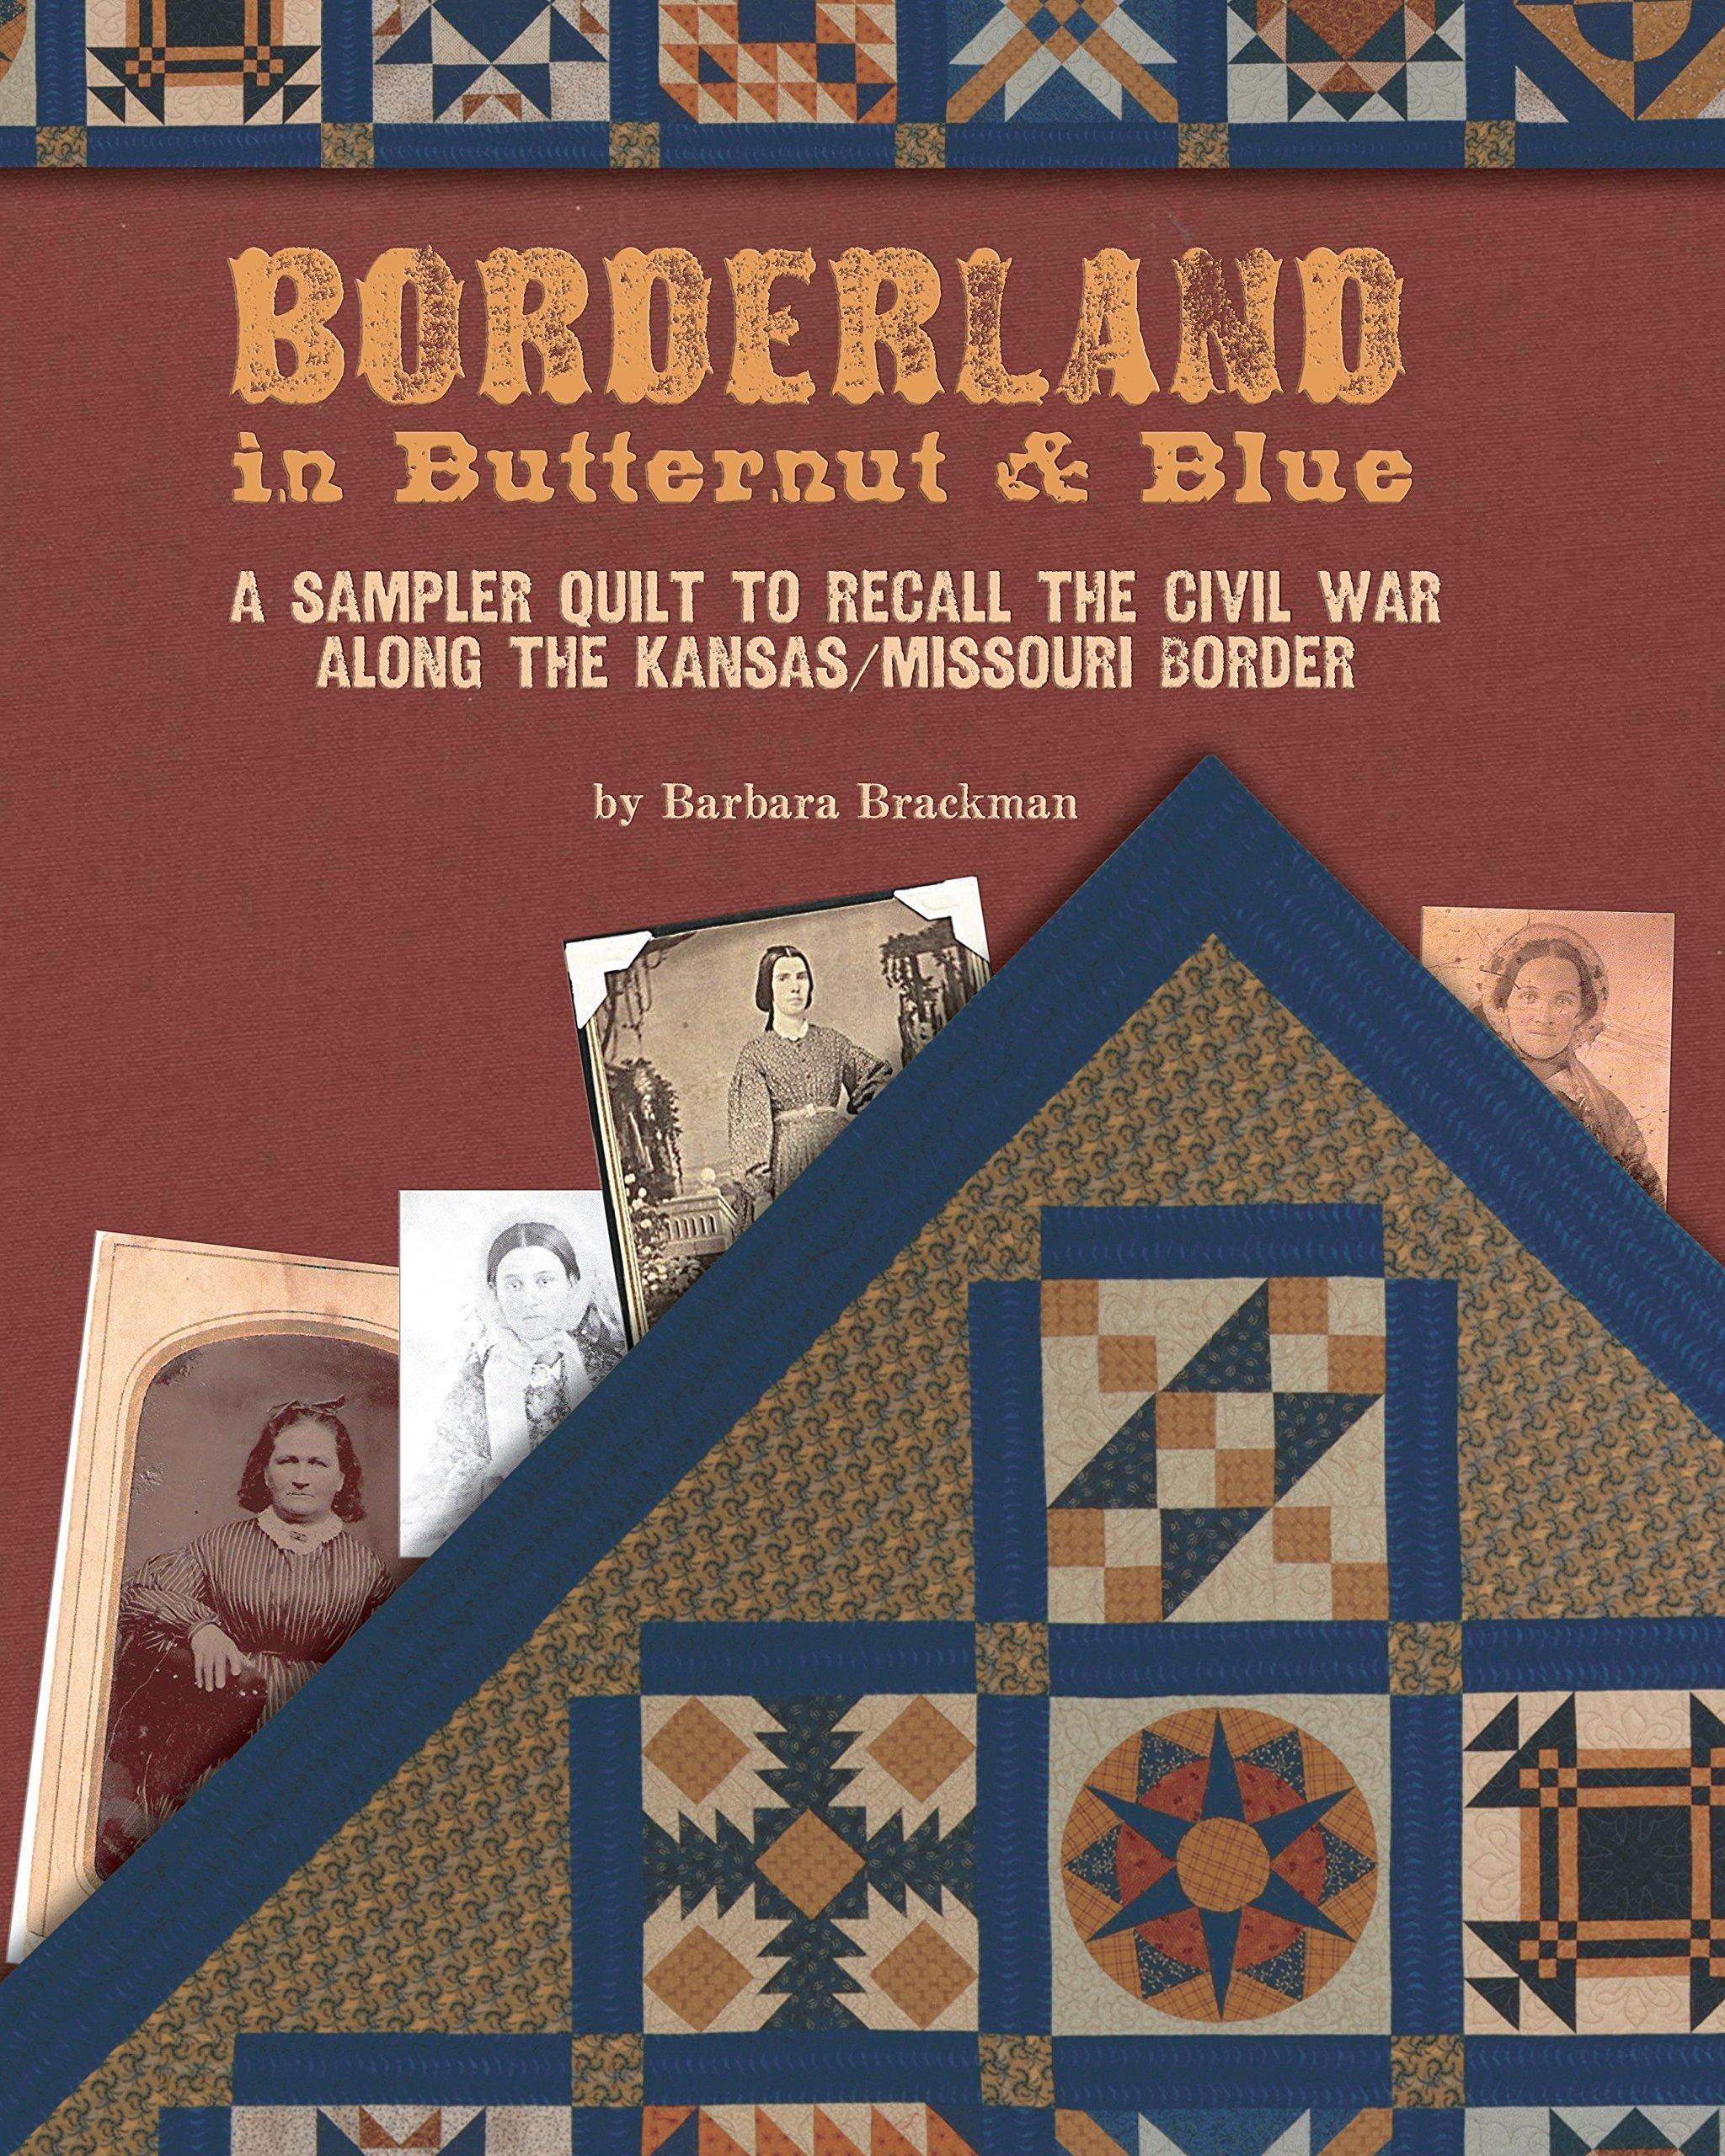 Borderland in Butternut & Blue: A Sampler Quilt to Recall the Civil War pdf